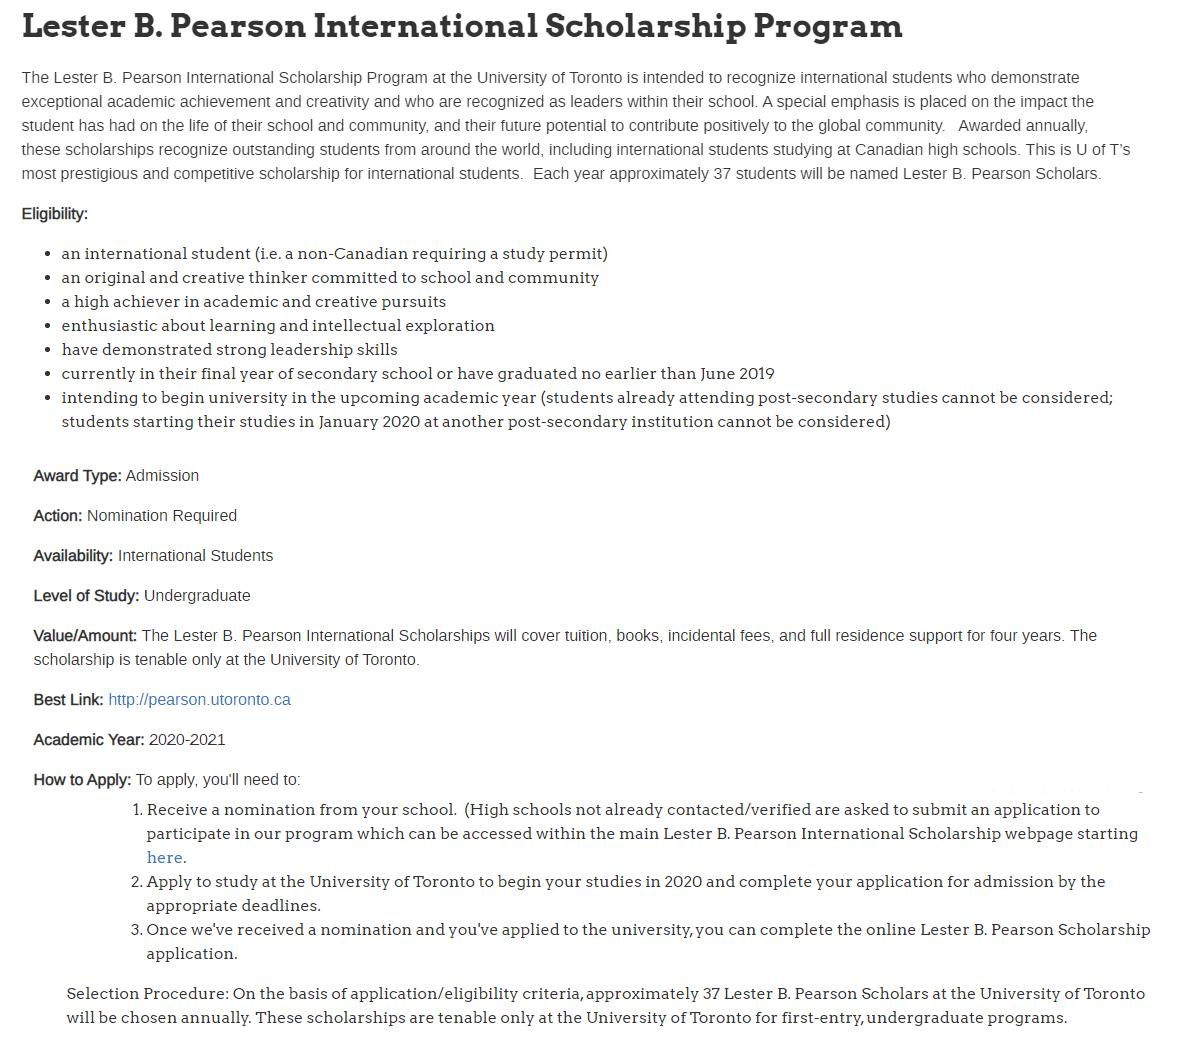 https://ishallwin.com/Content/ScholarshipImages/University-of-Toronto-5.jpg